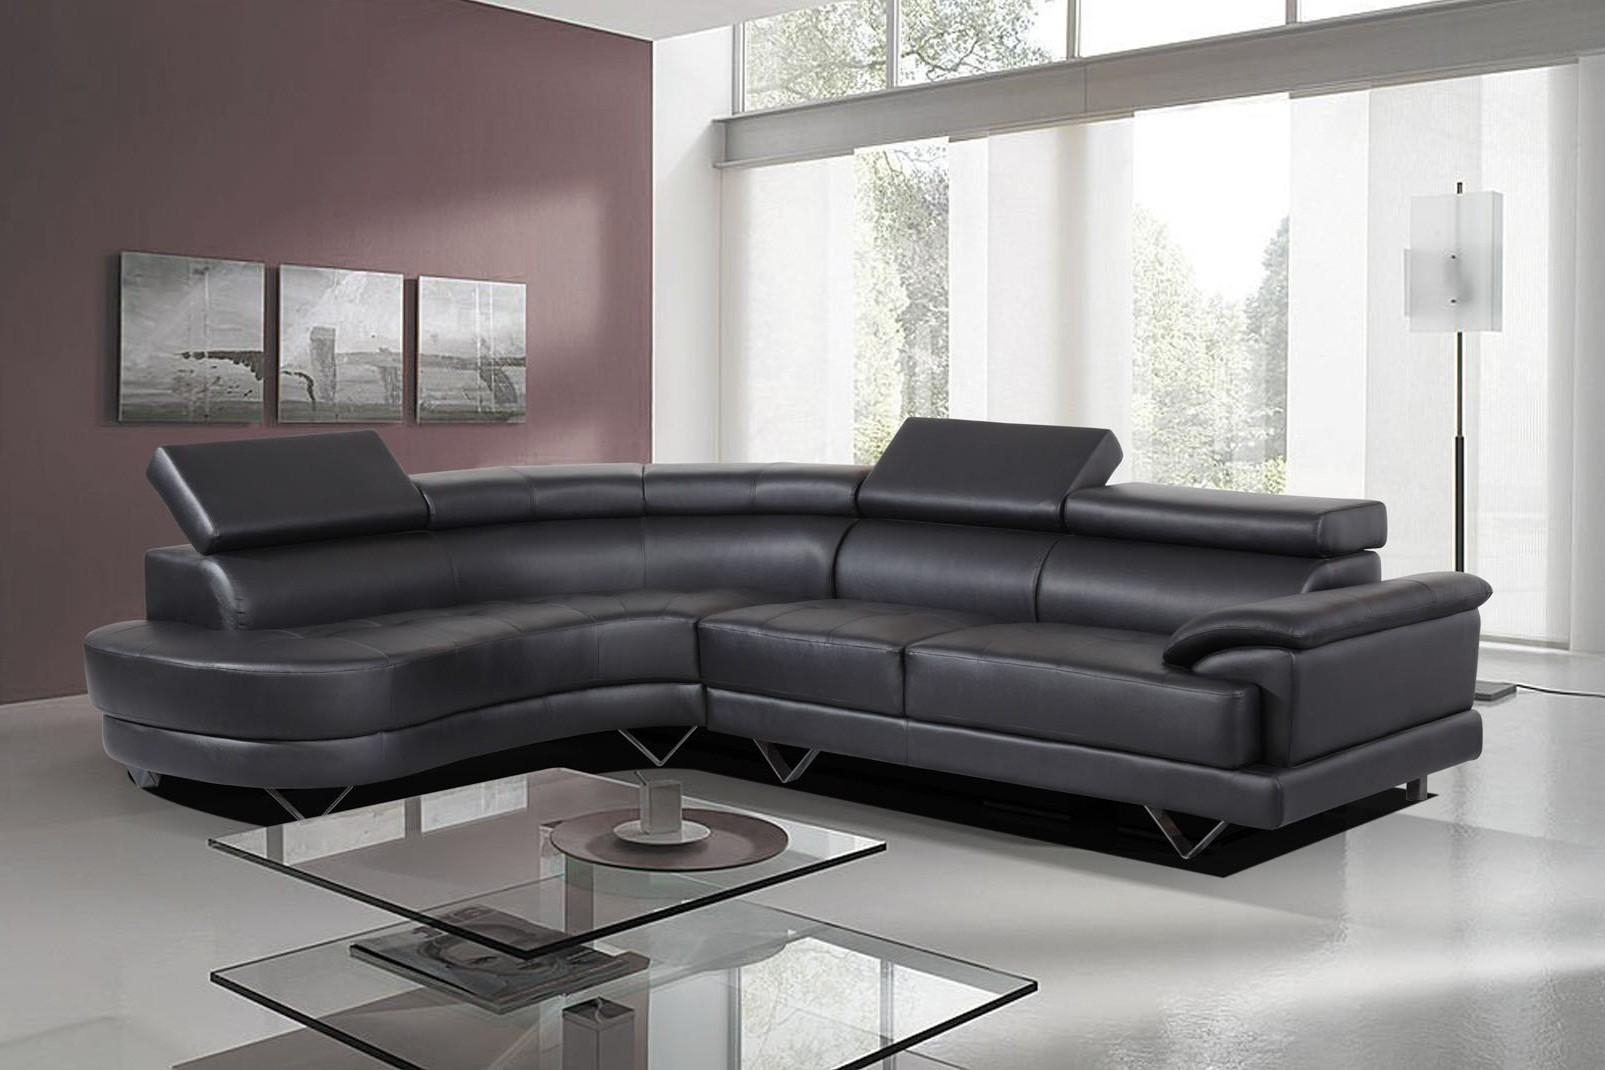 Sofa : Leather Modular Corner Sofa Cool Home Design Unique With With Unique Corner Sofas (Image 12 of 21)